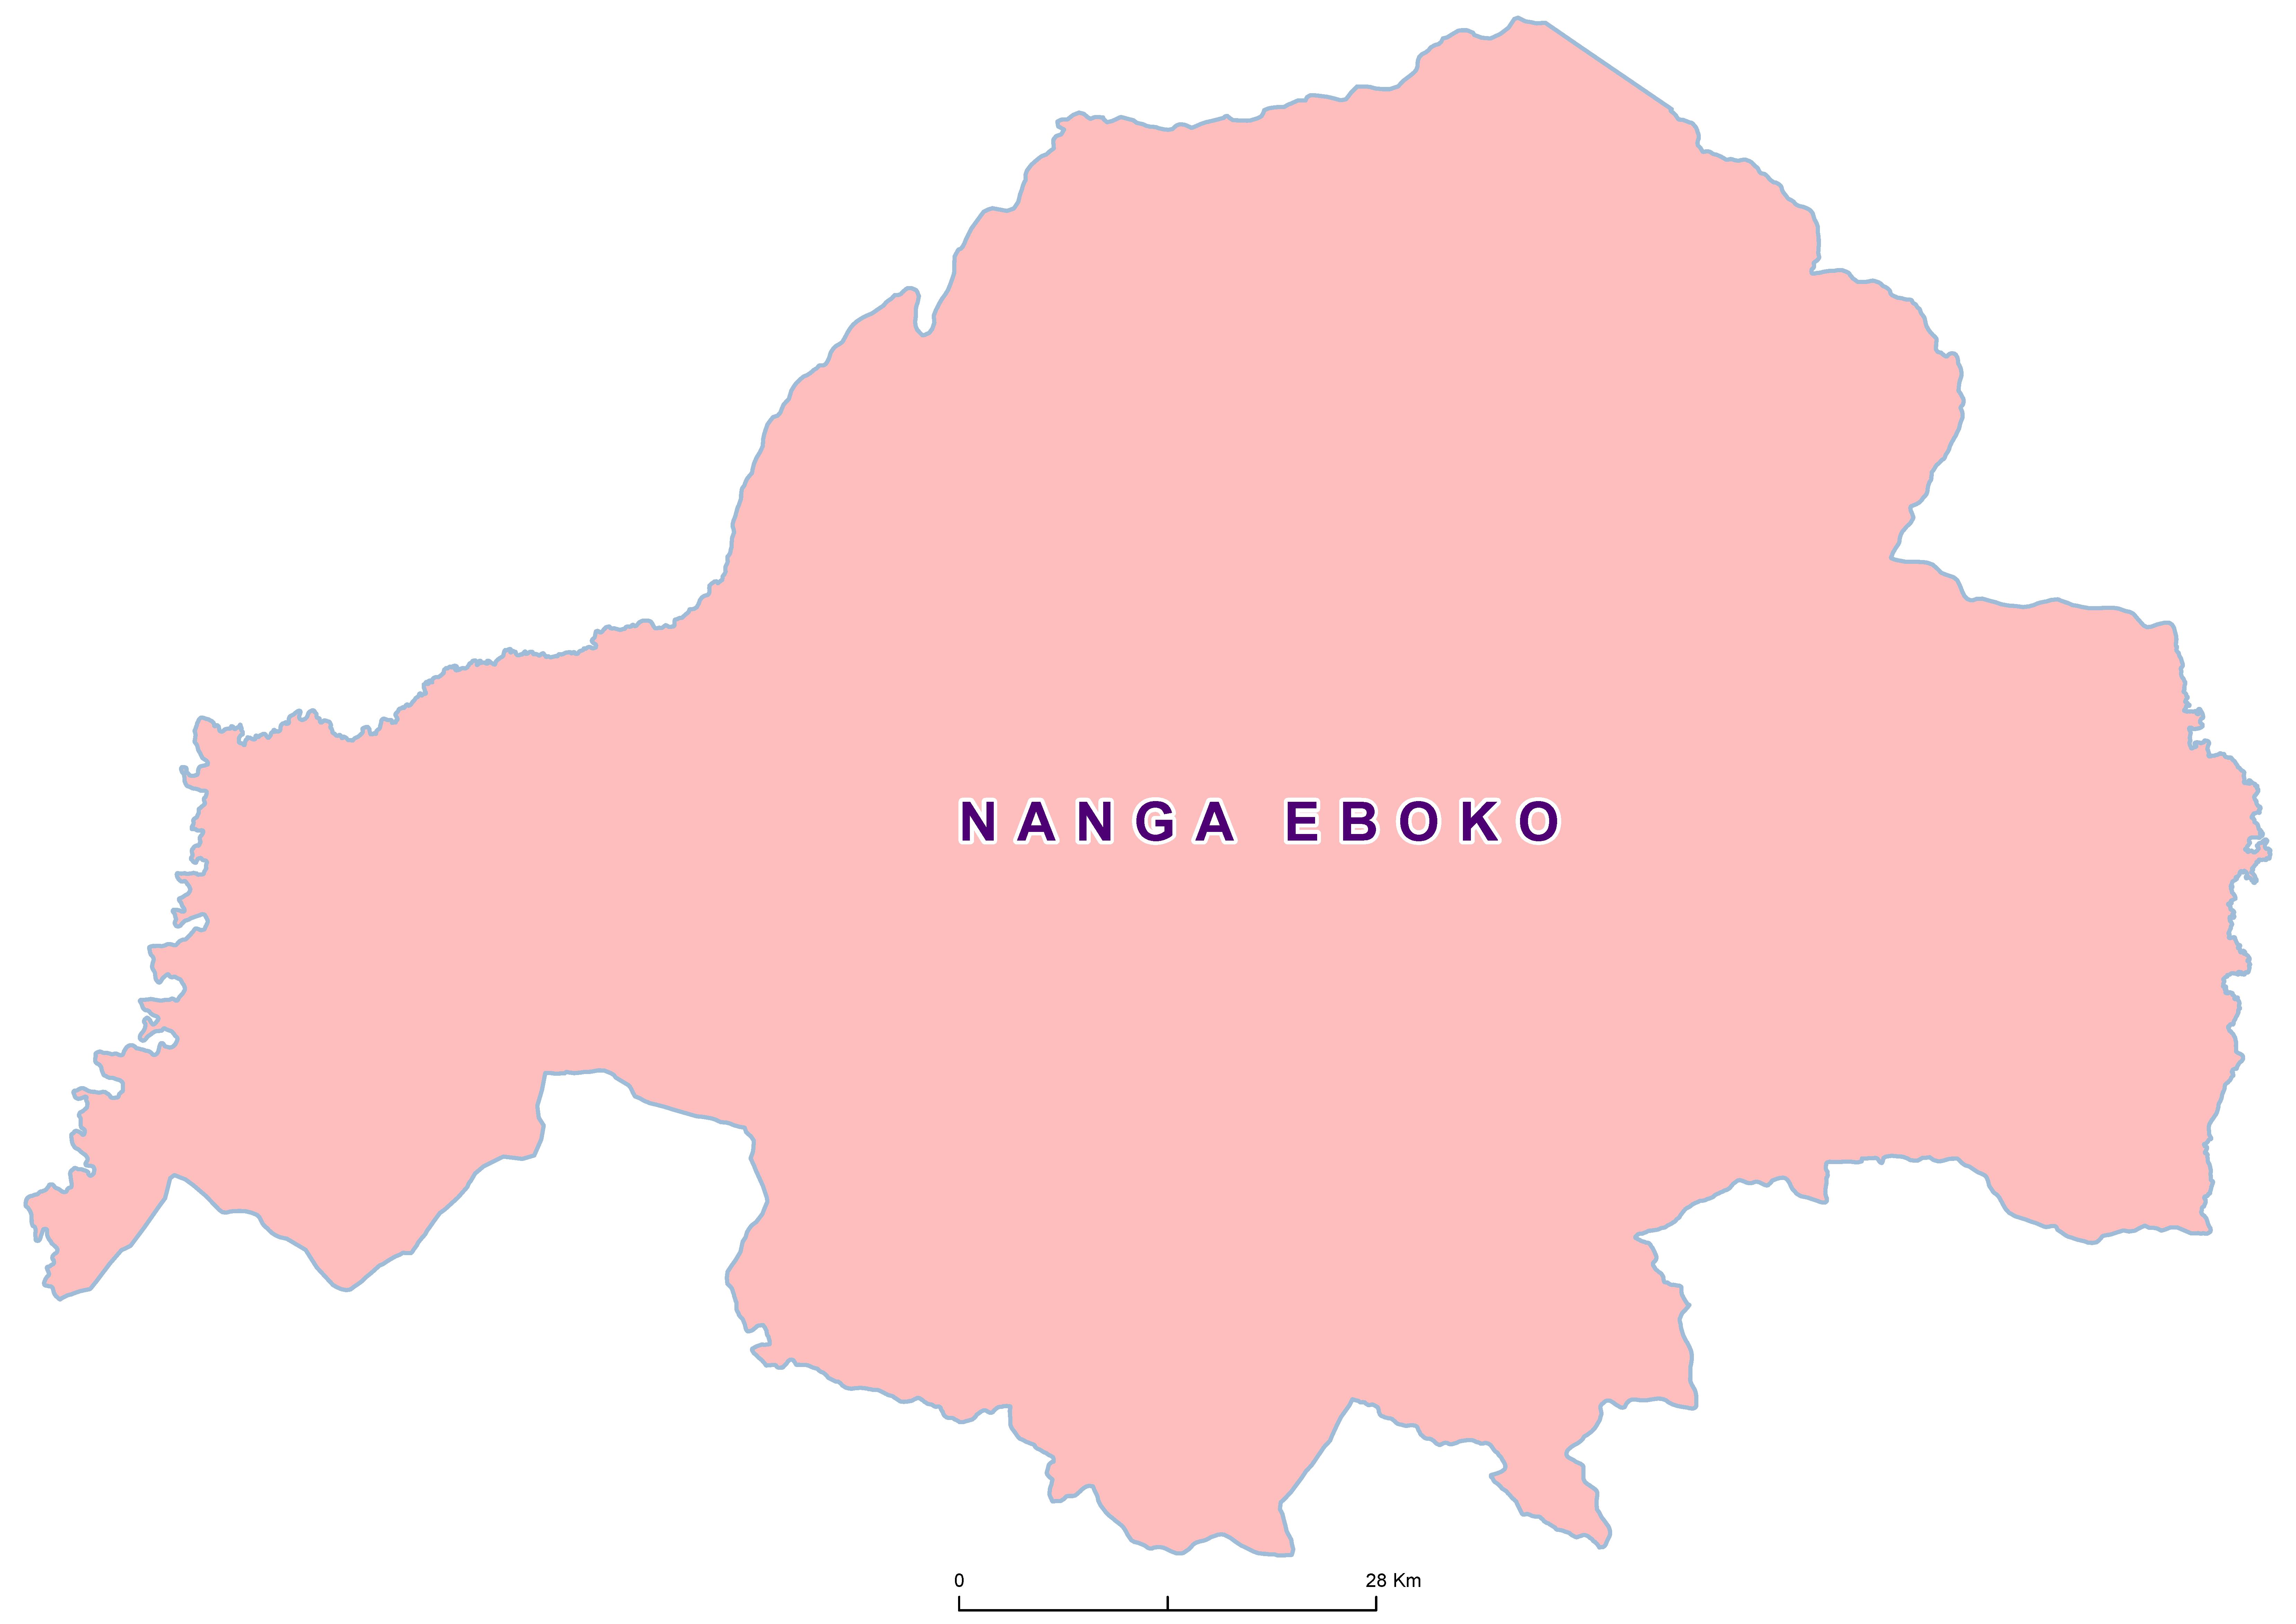 Nanga eboko Mean SCH 20100001